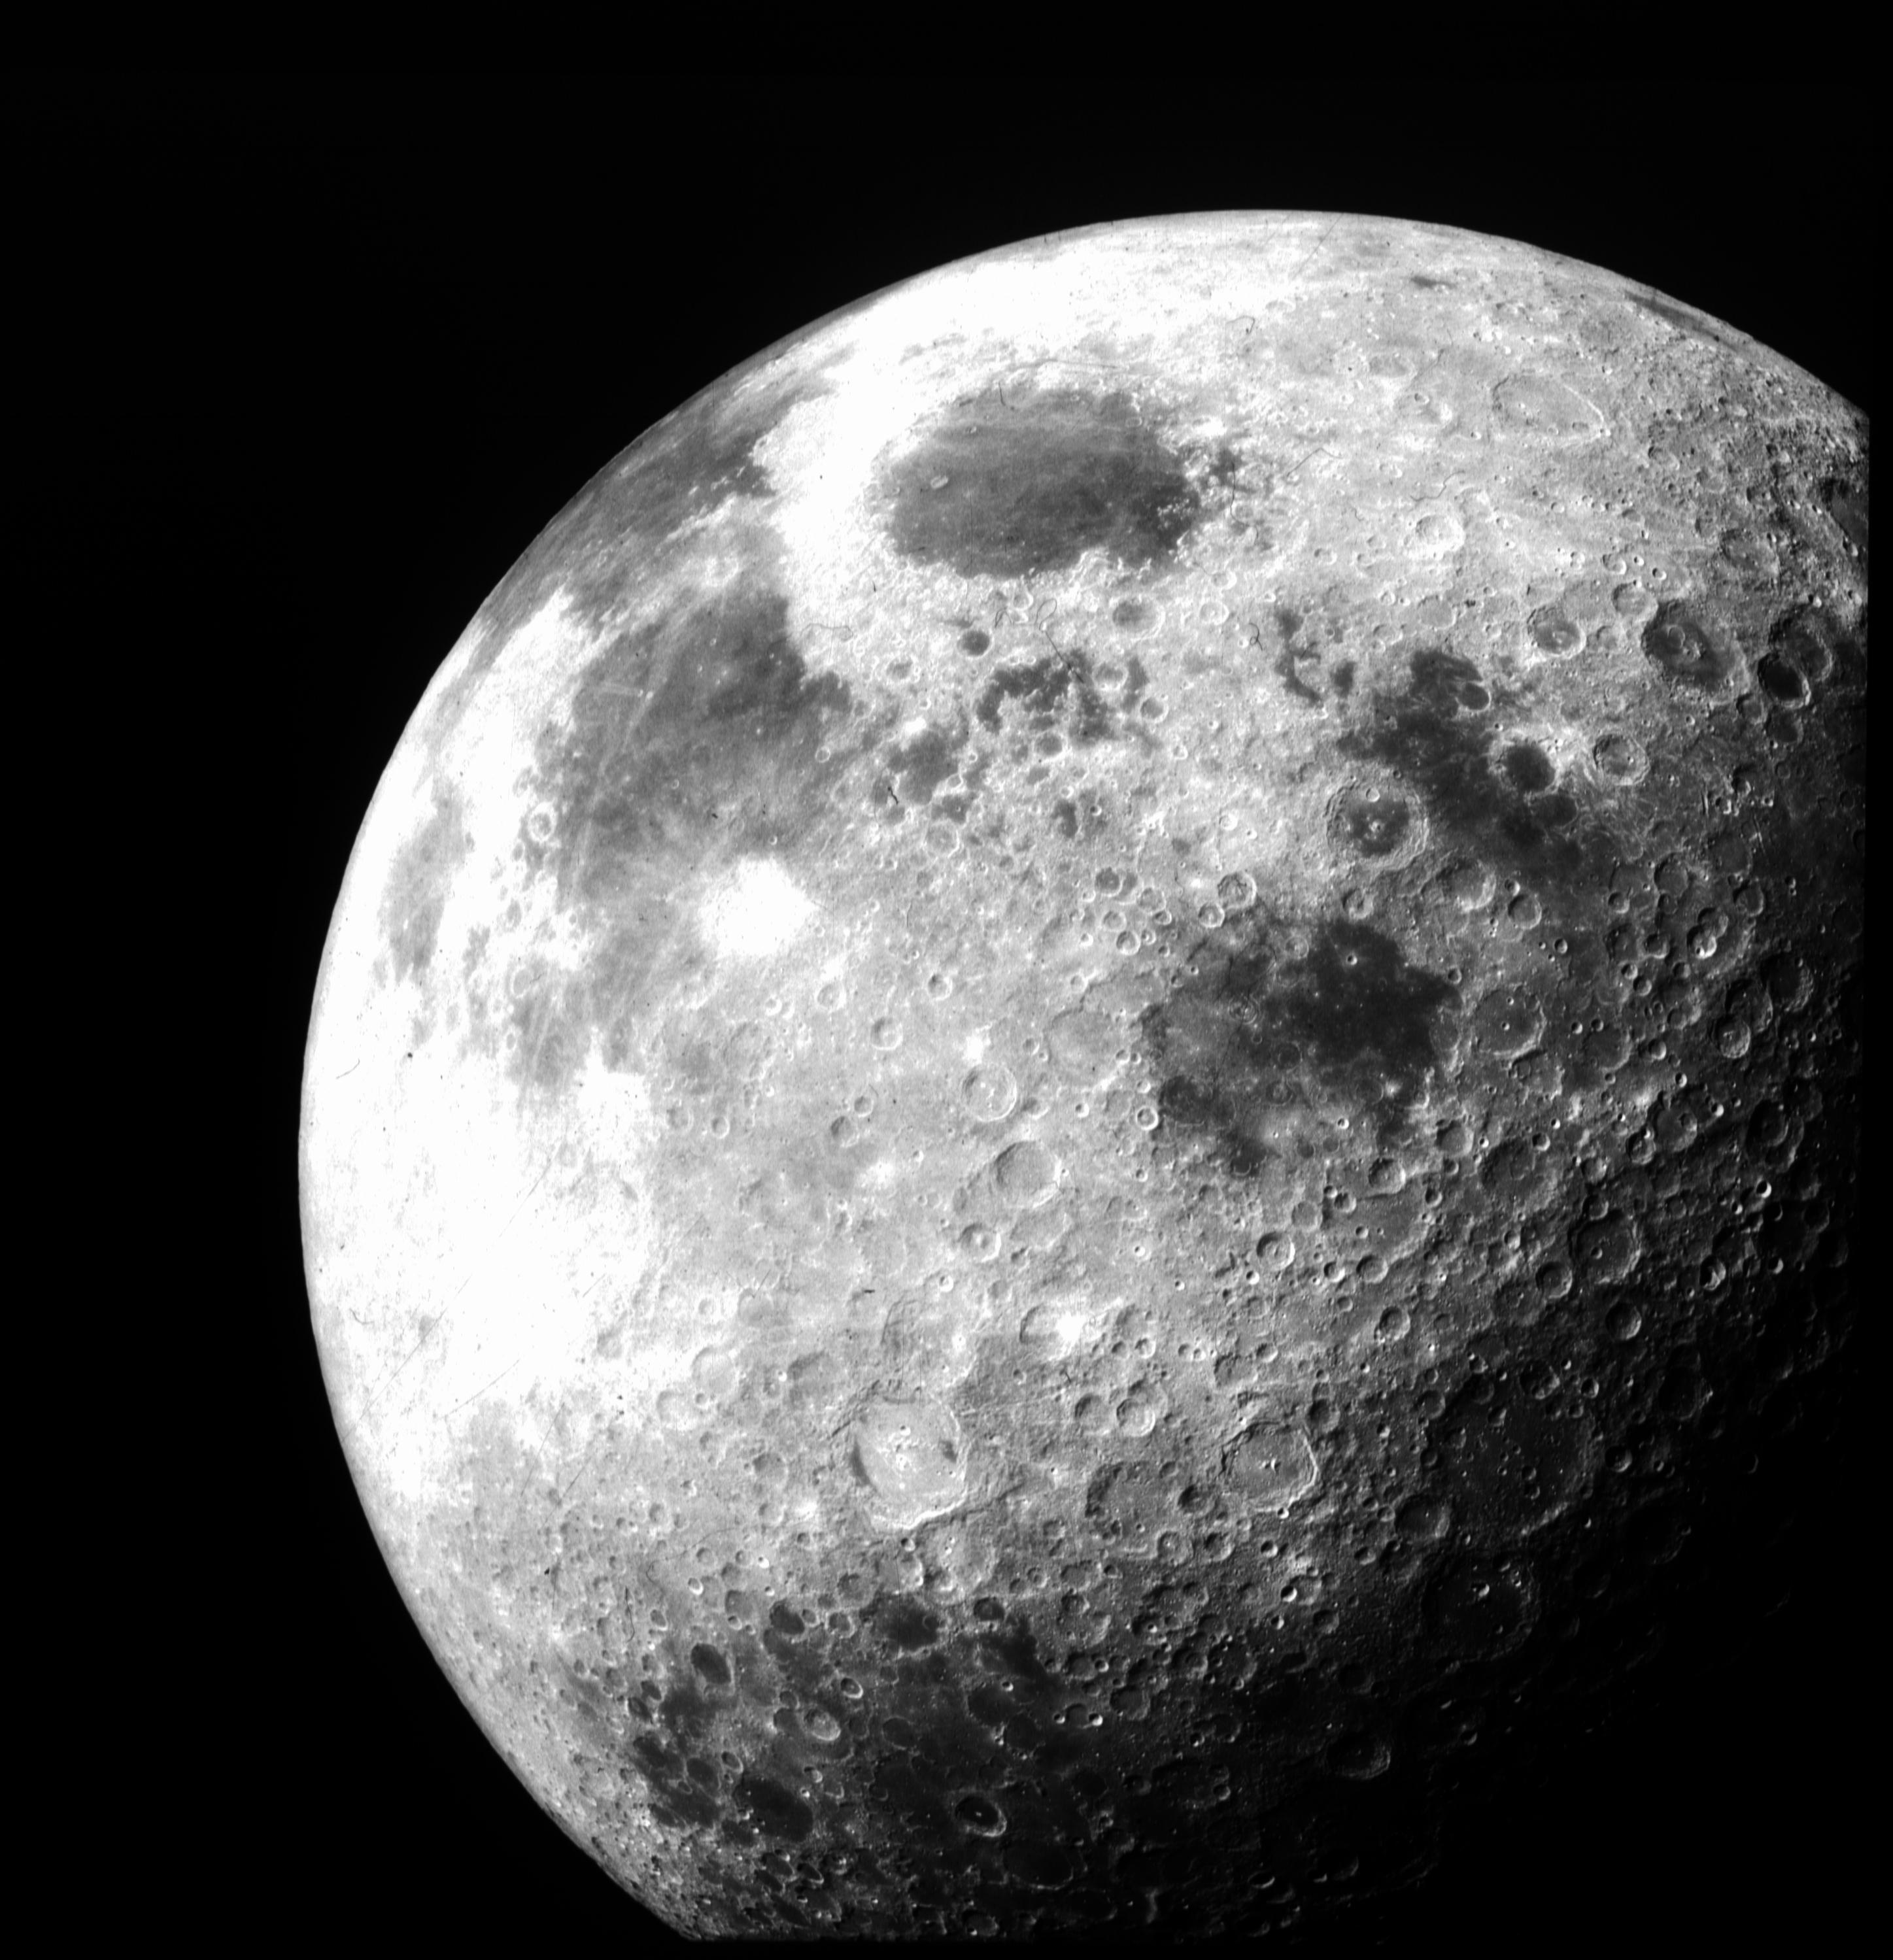 The moon as seen from Apollo 12